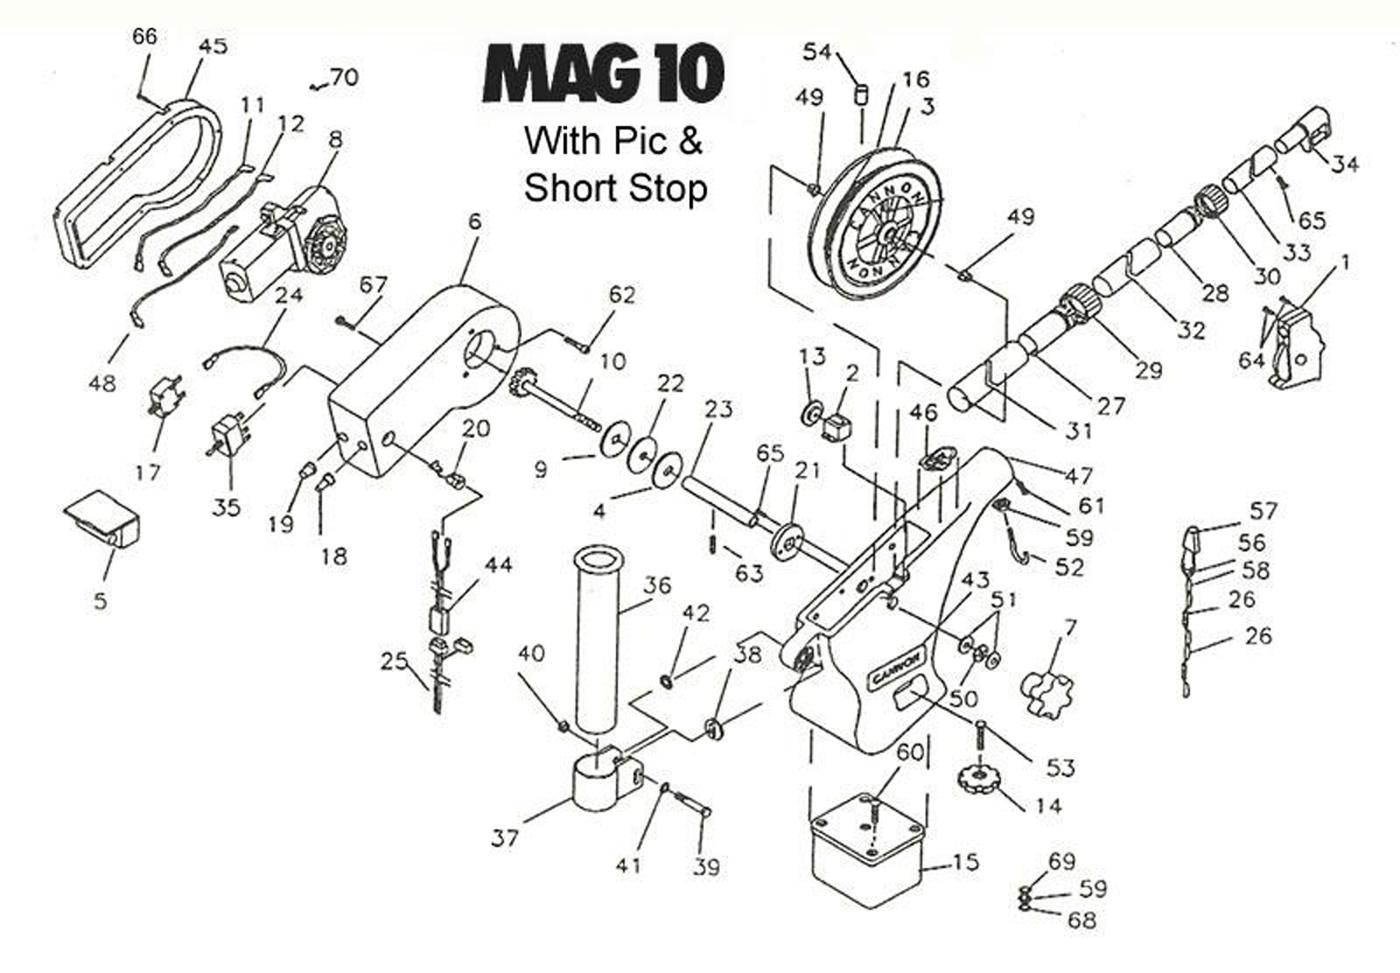 Order Cannon Mag 10 (Pre 2006 Models) electric downrigger